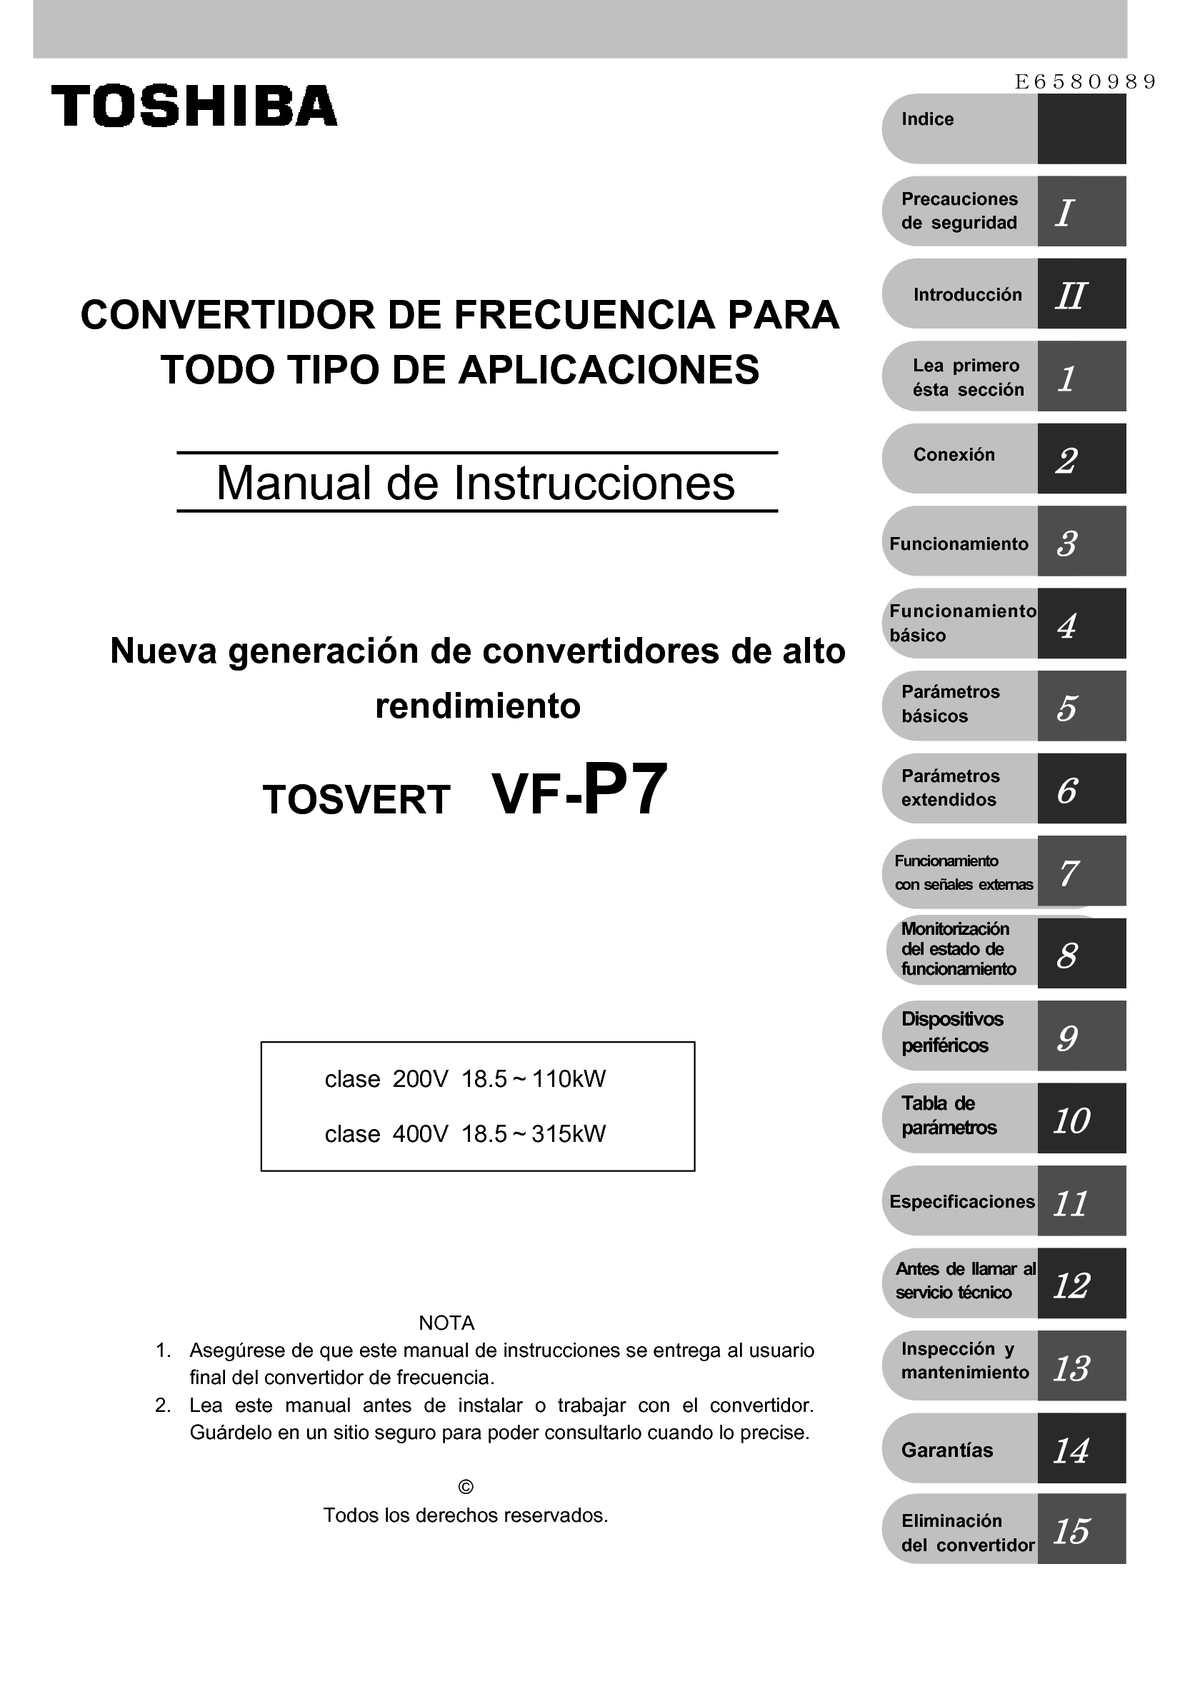 MANUAL VARIADOS FRECUENCIA TOSHIBA VF-P7 CASTELLANO